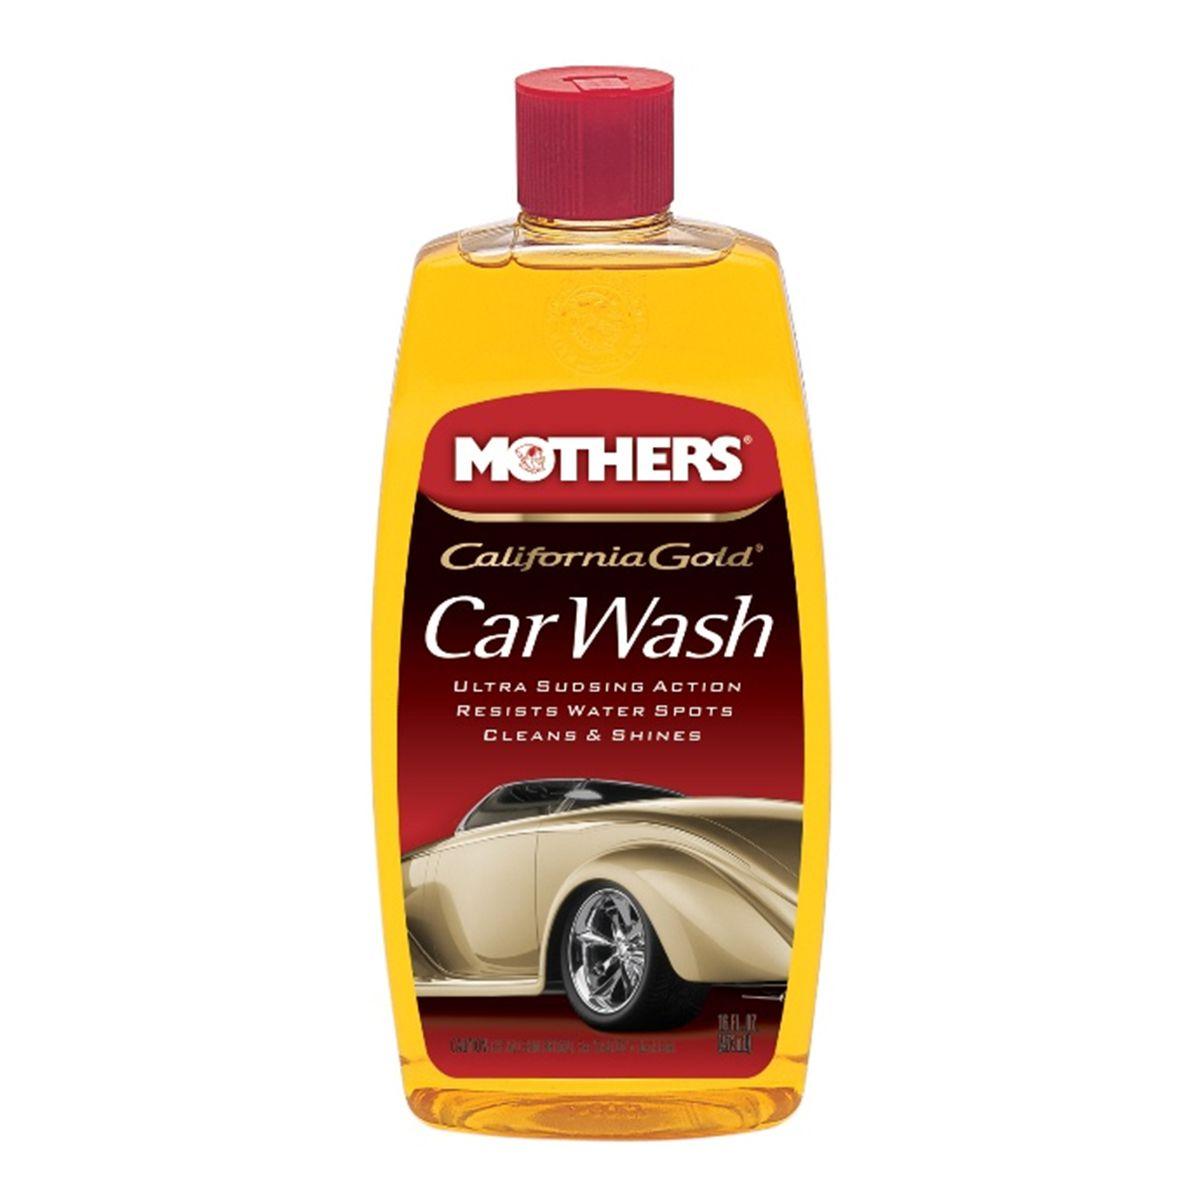 Mothers California Gold Car Wash / Shampoo Mothers 473 Ml